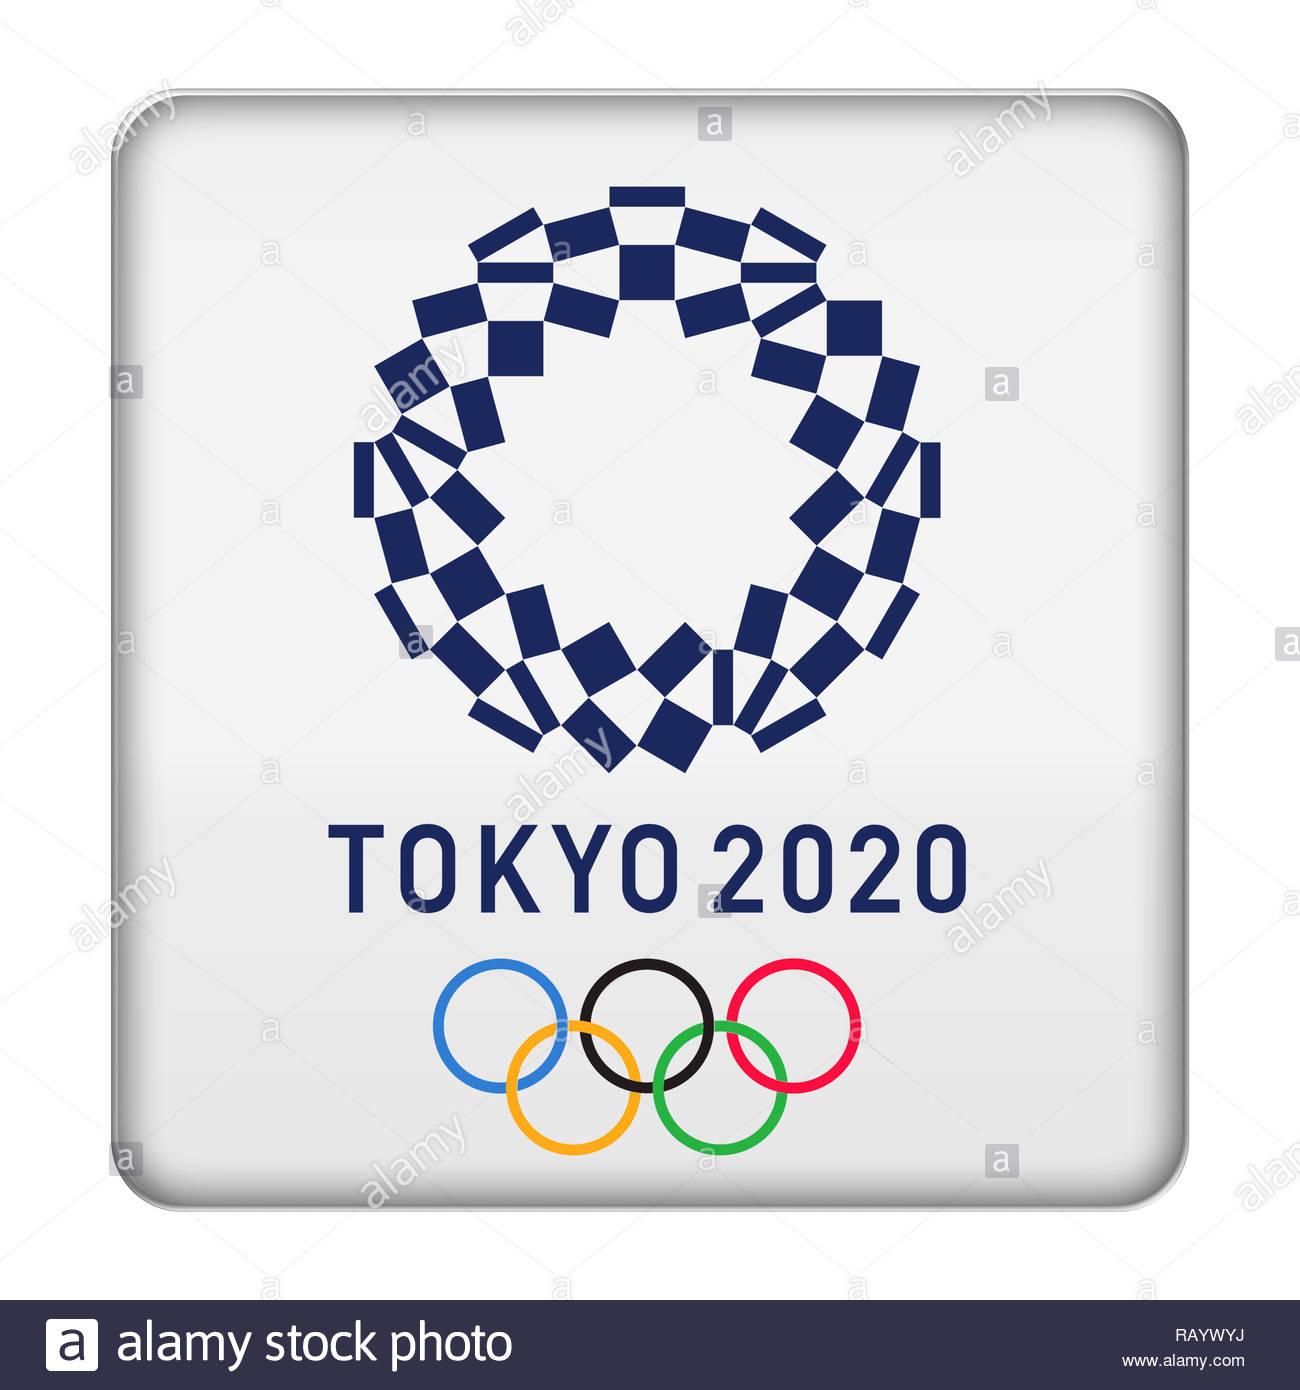 Tokyo 2020 logo sign Stock Photo